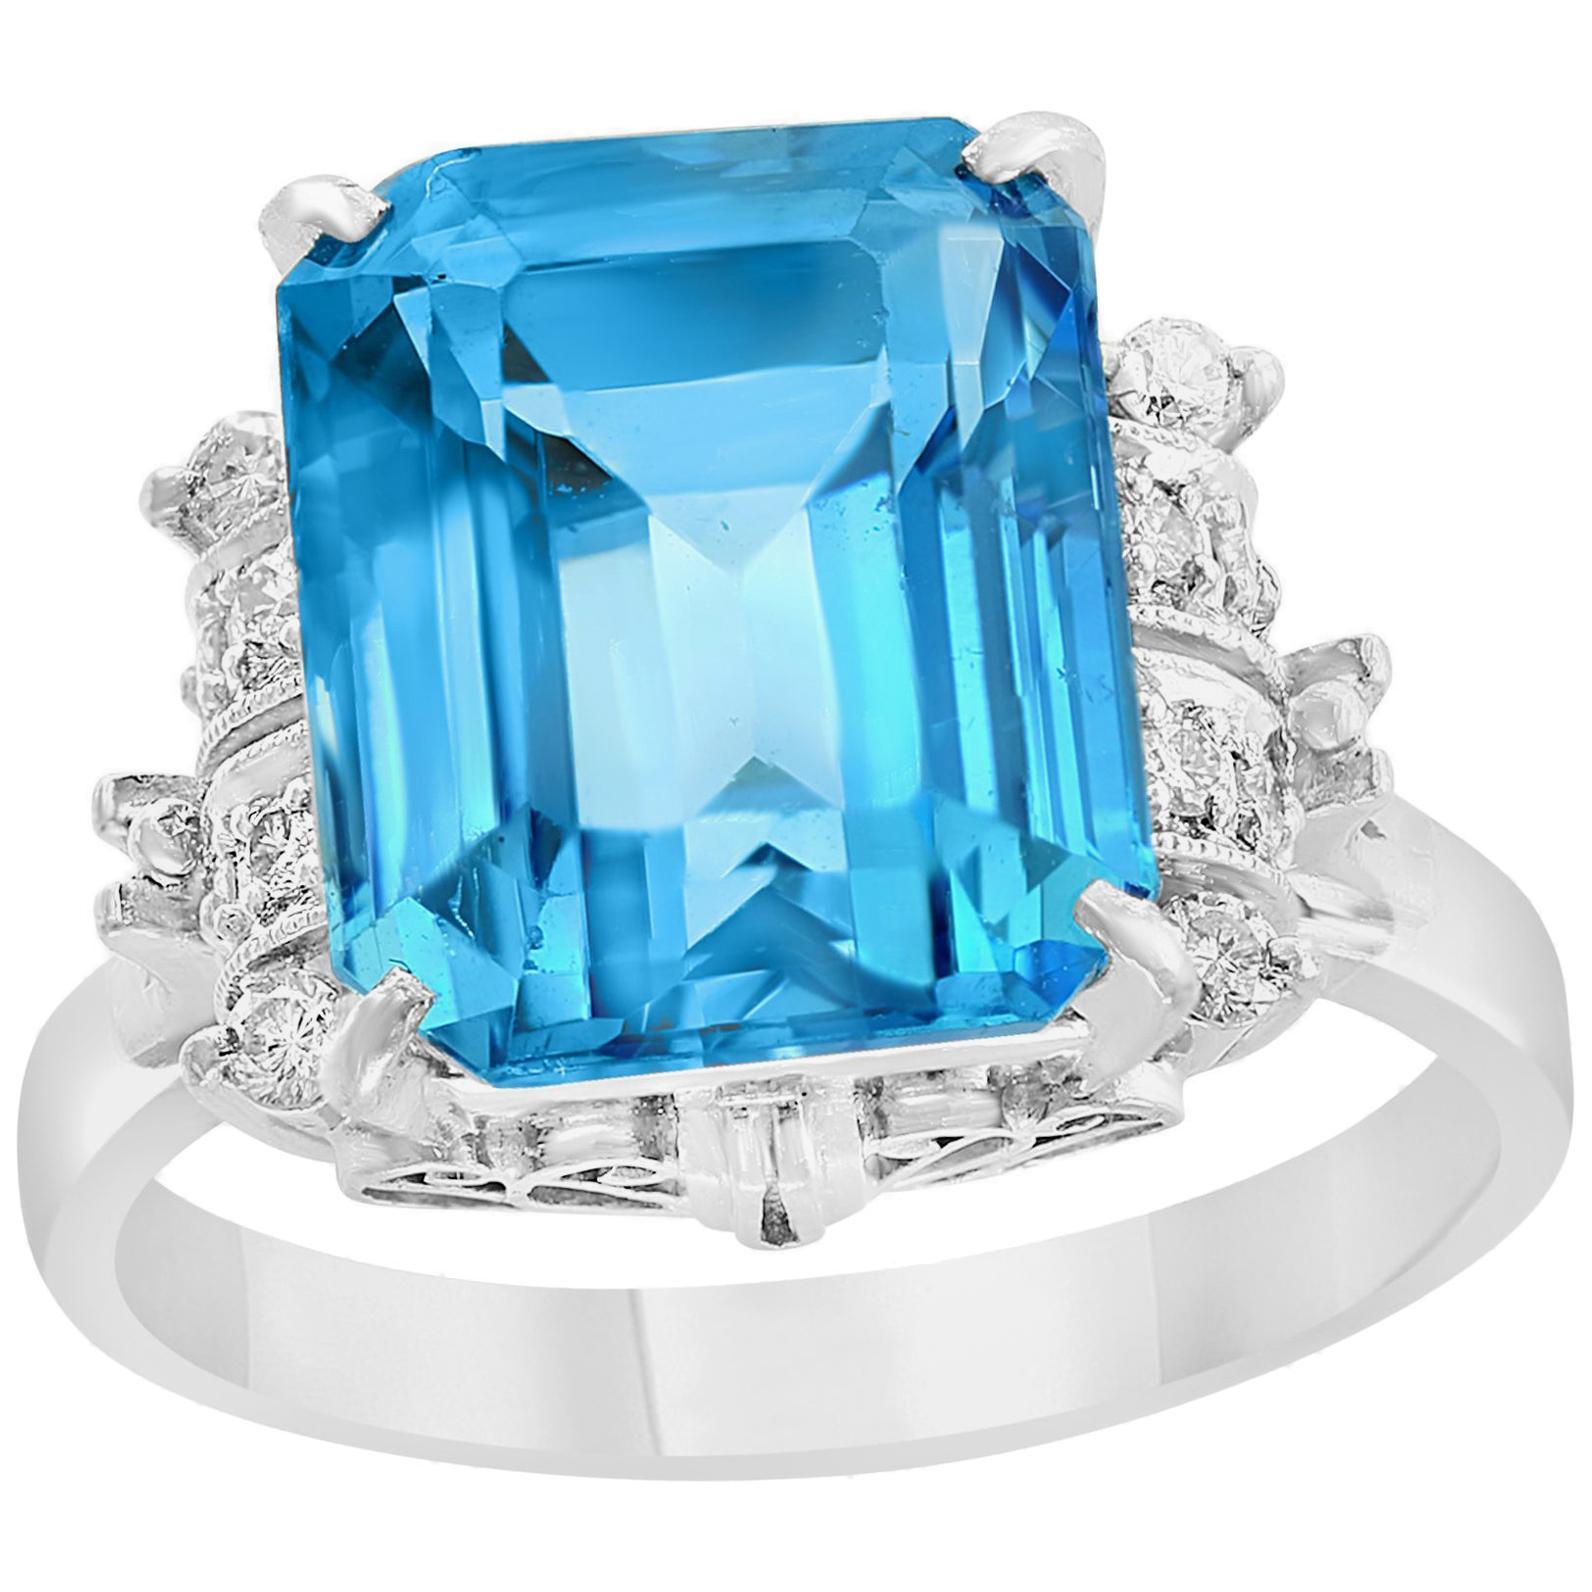 5.8 Carat Finest Blue Topaz Diamond Platinum Ring Estate